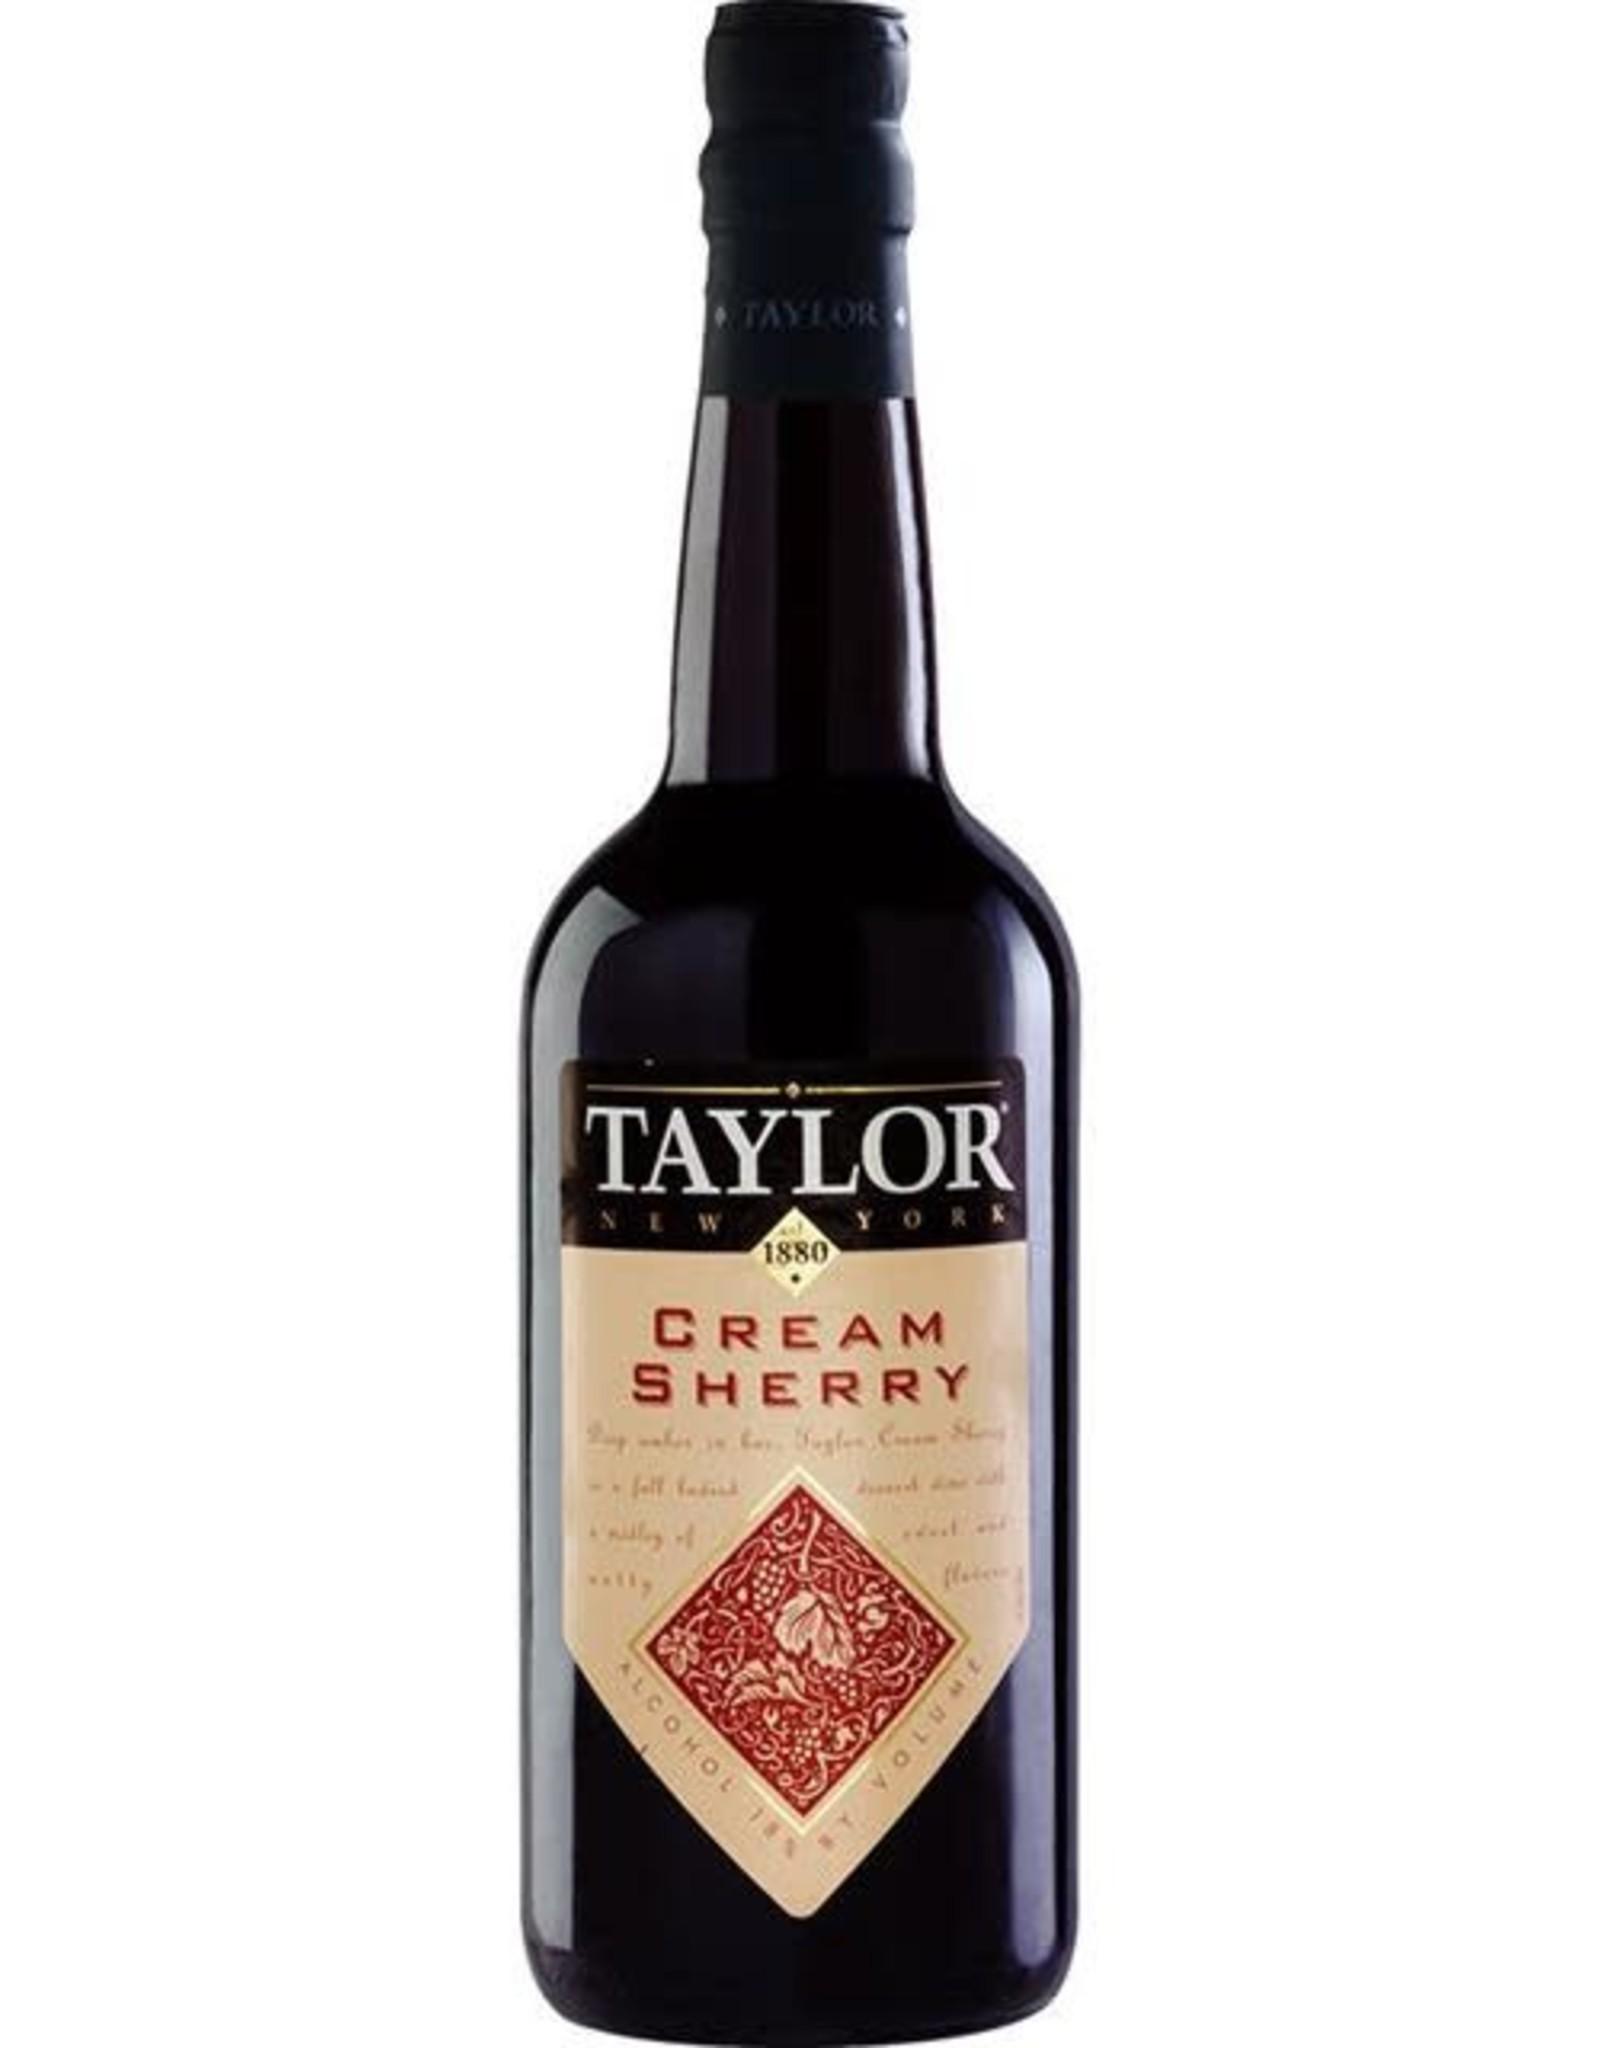 TAYLOR CREAM SHERRY 750ML